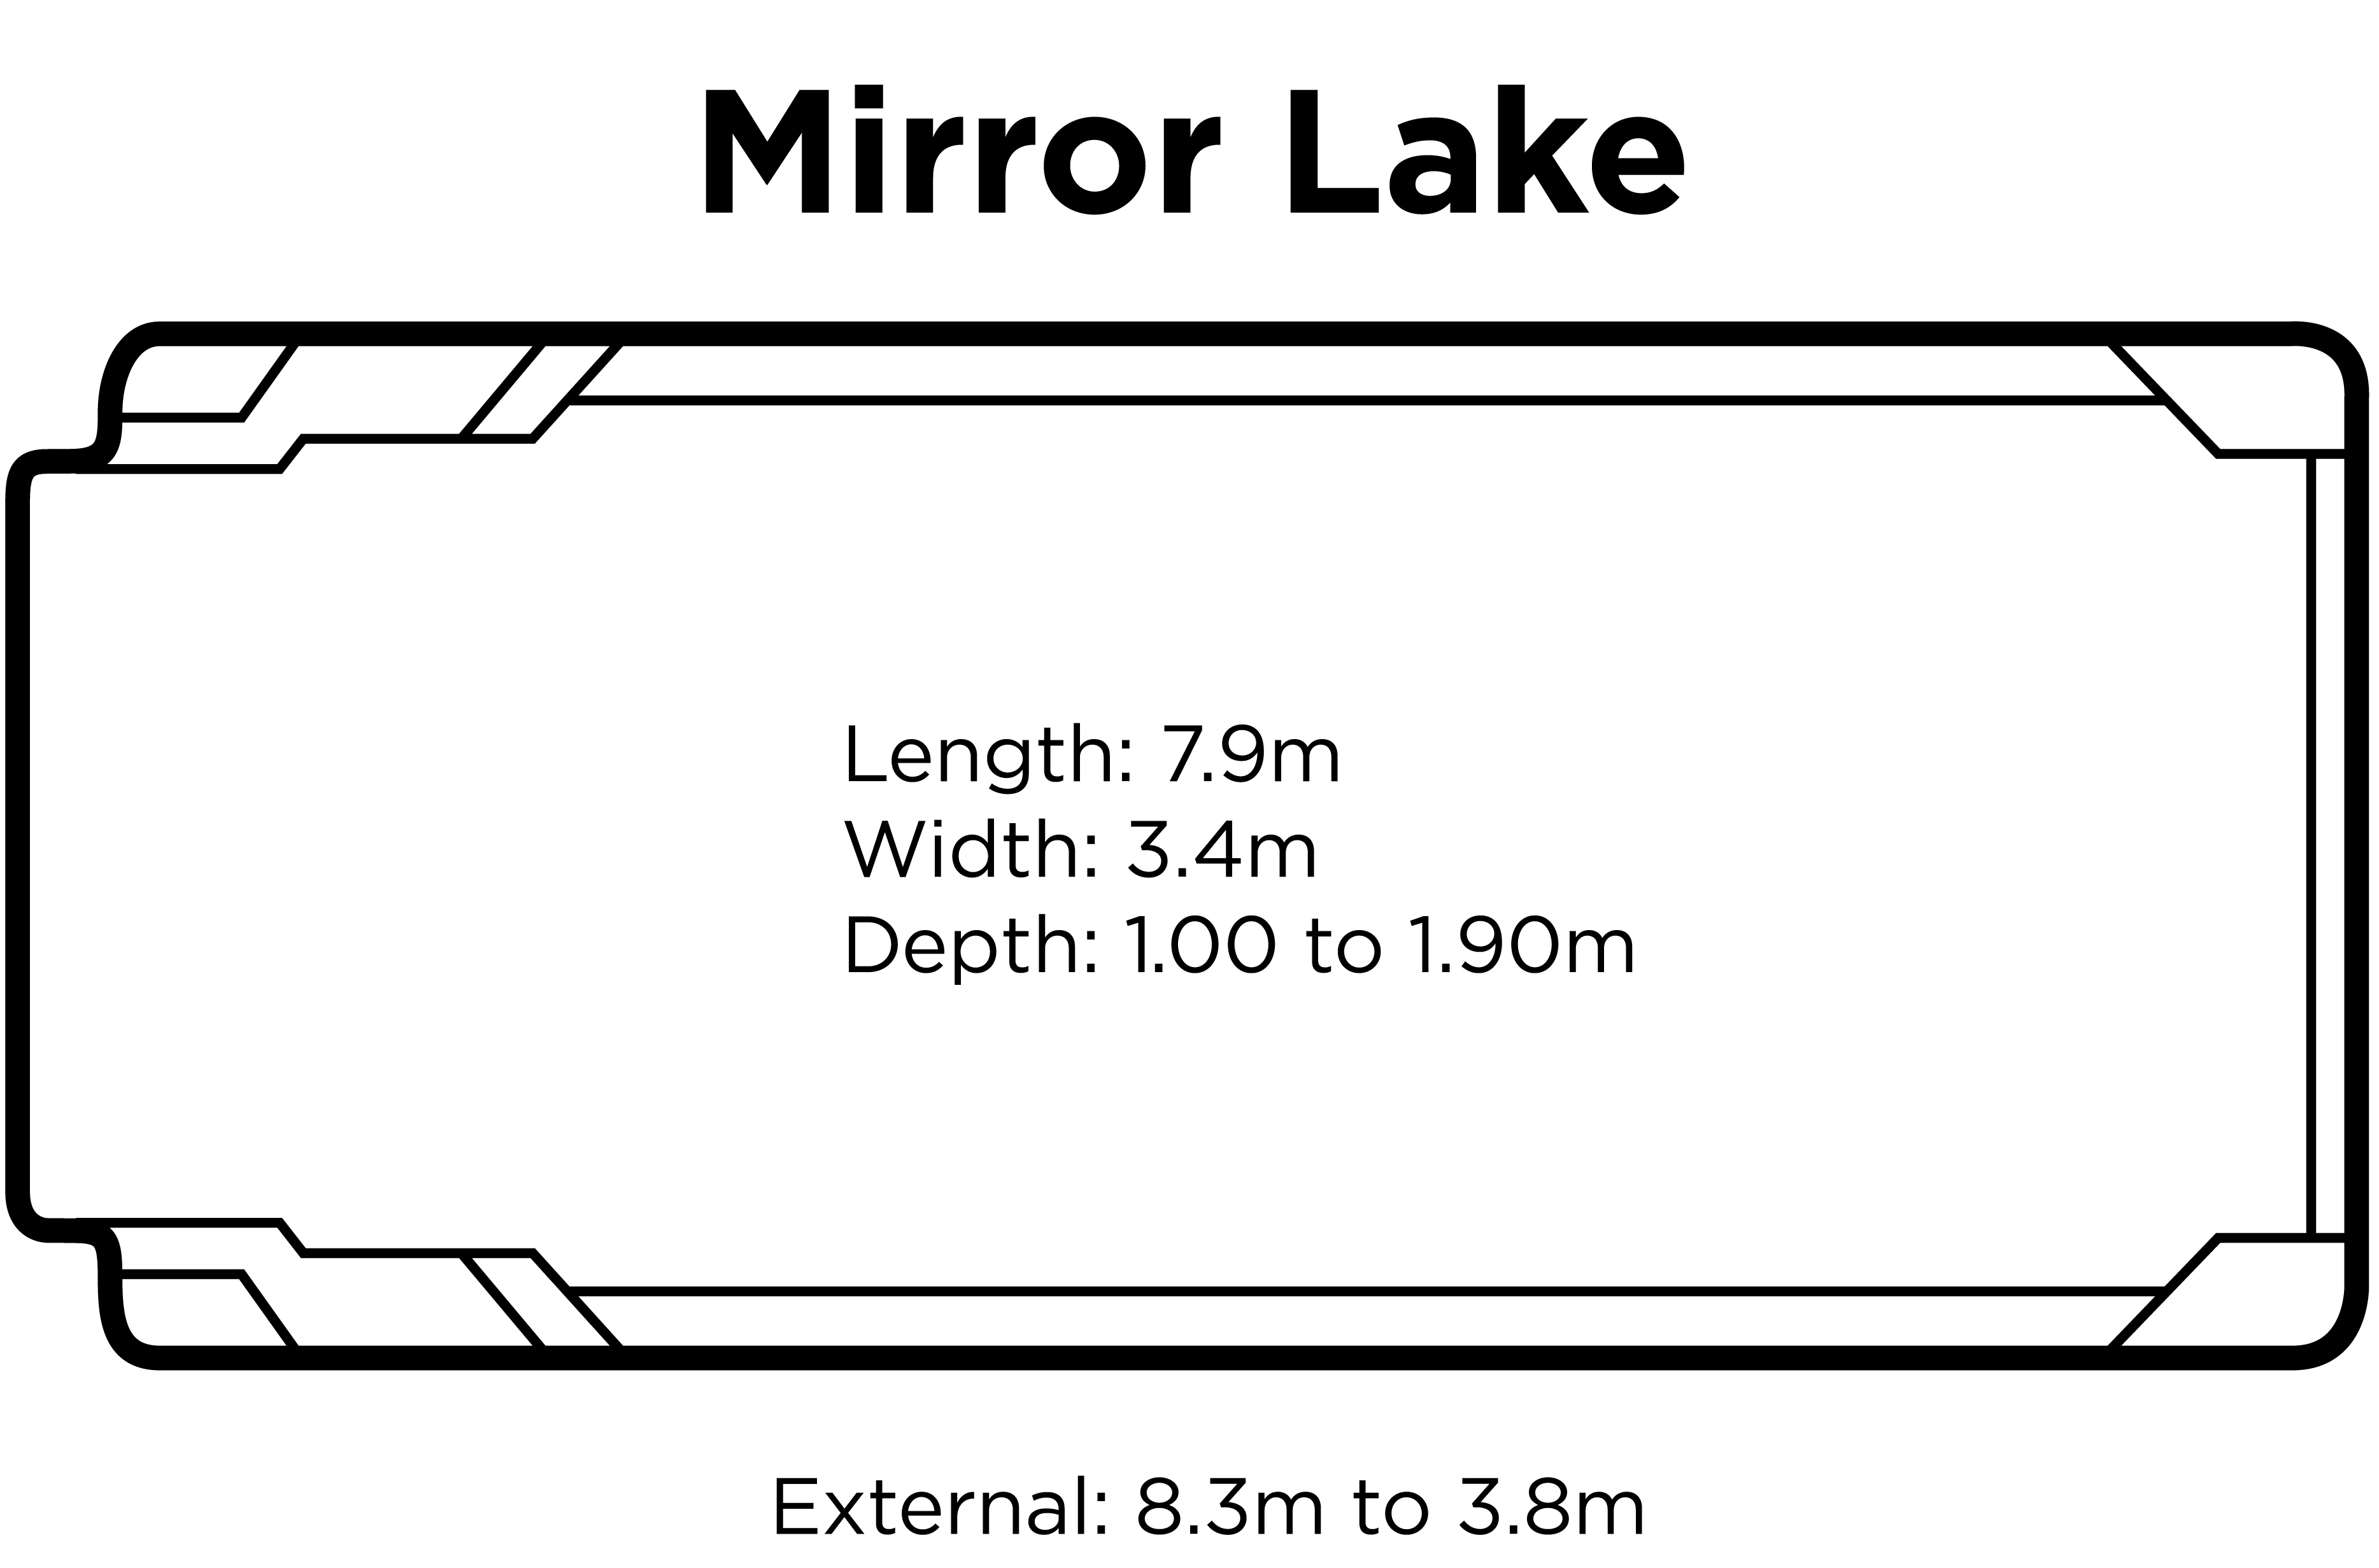 FINALMirror Lake